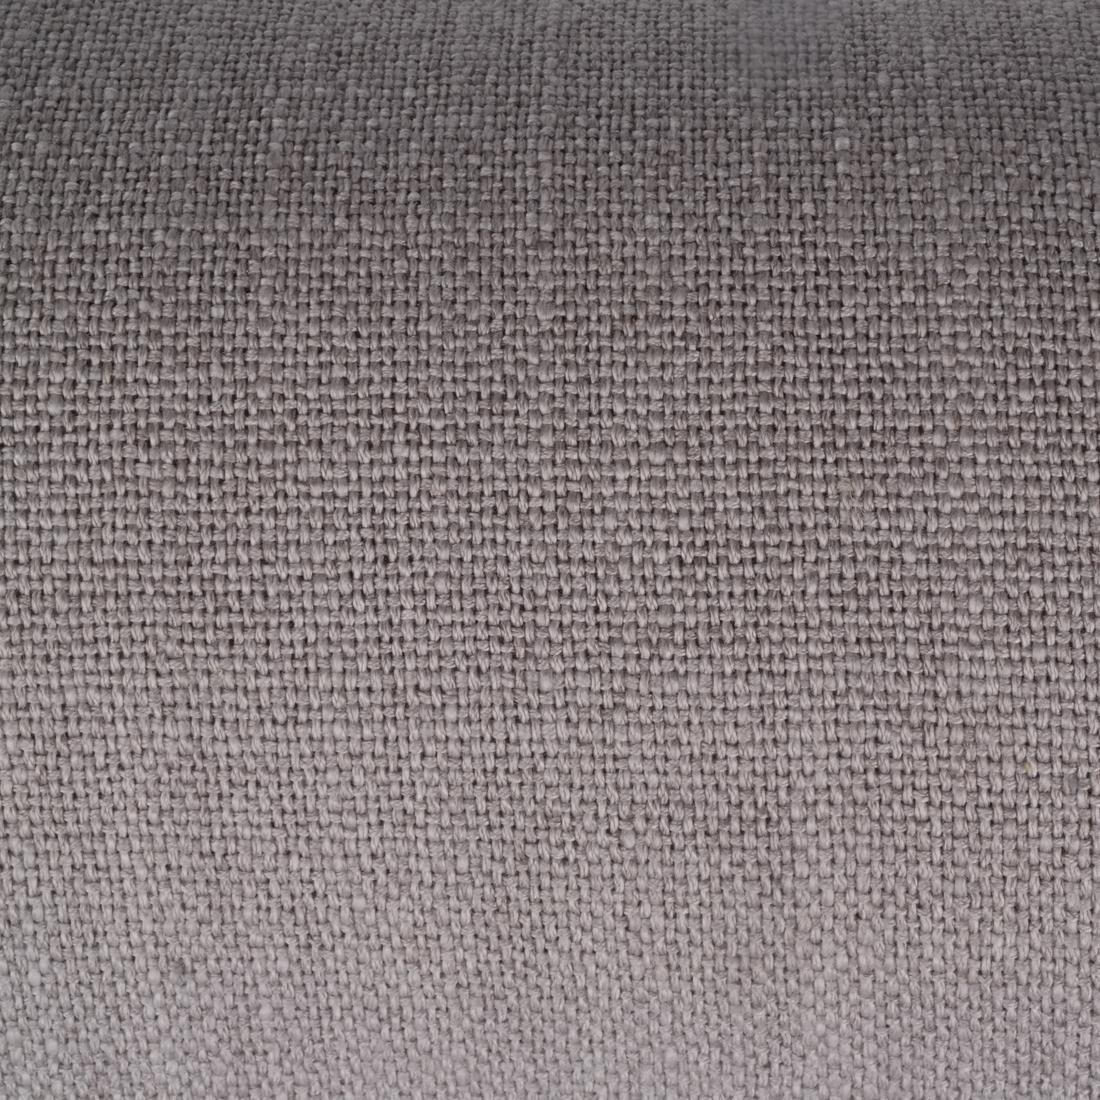 Holly Hunt Upholstery Fabric Bolt - 2